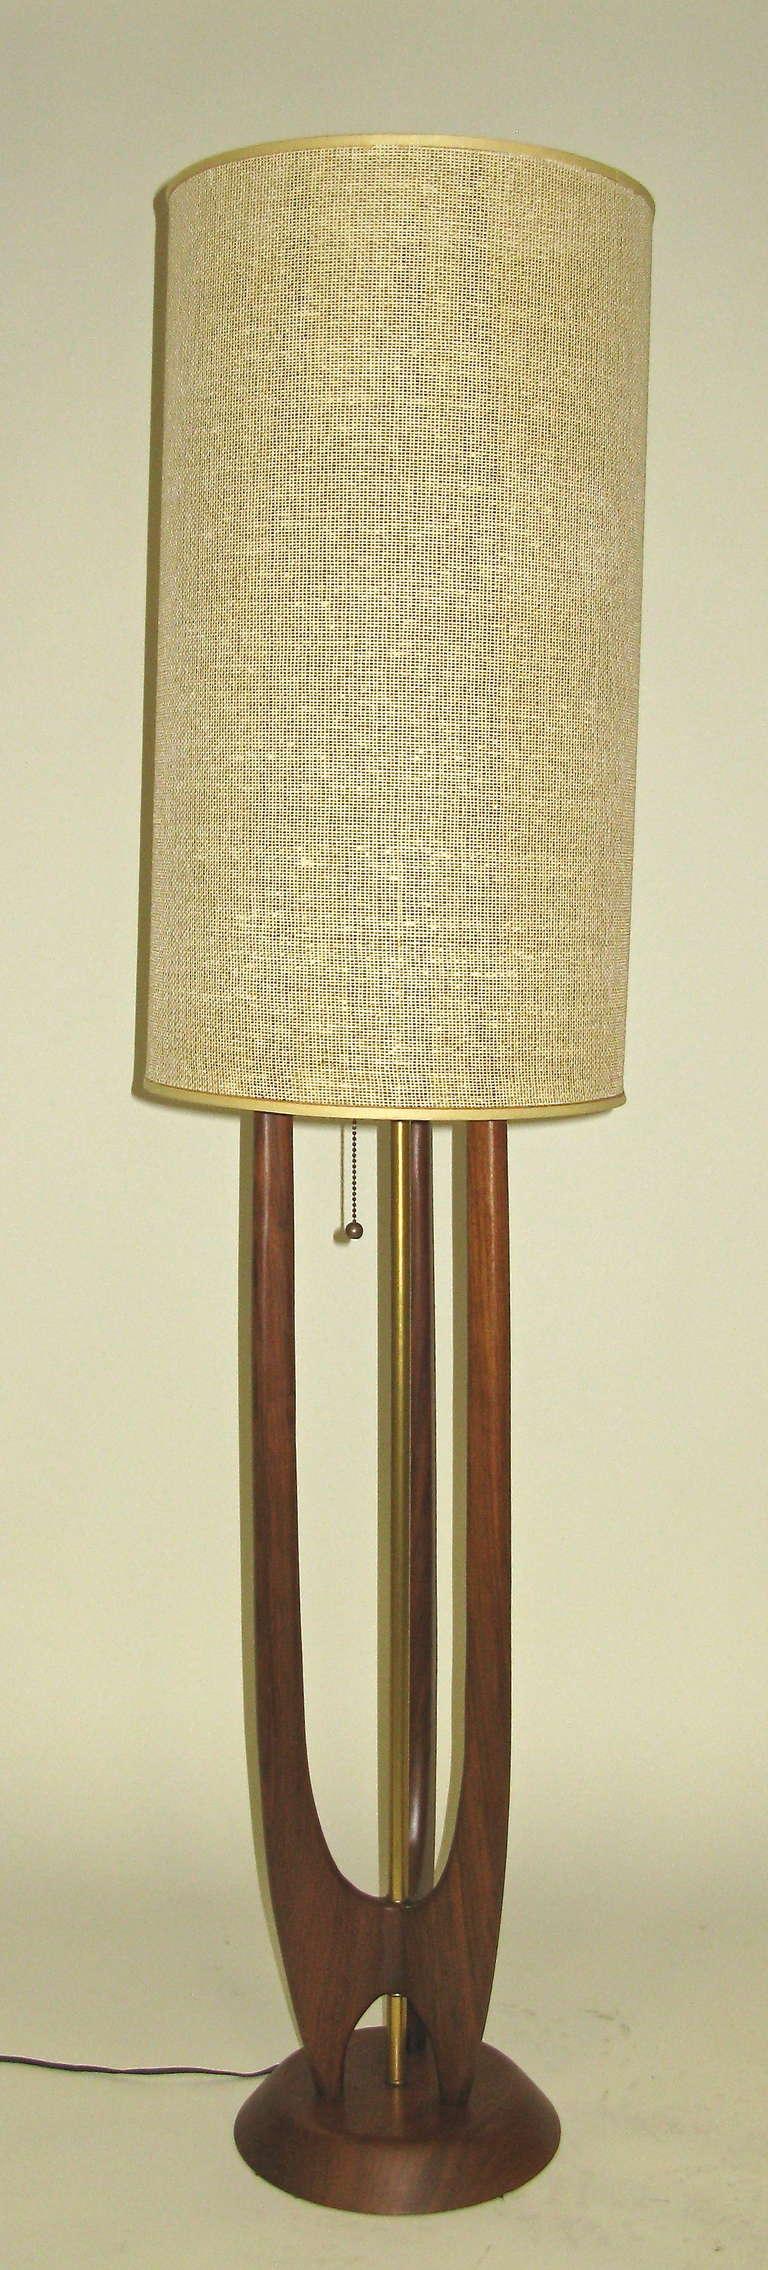 Versatile 1960 Adrian Pearsall Floor Lamp At 1stdibs